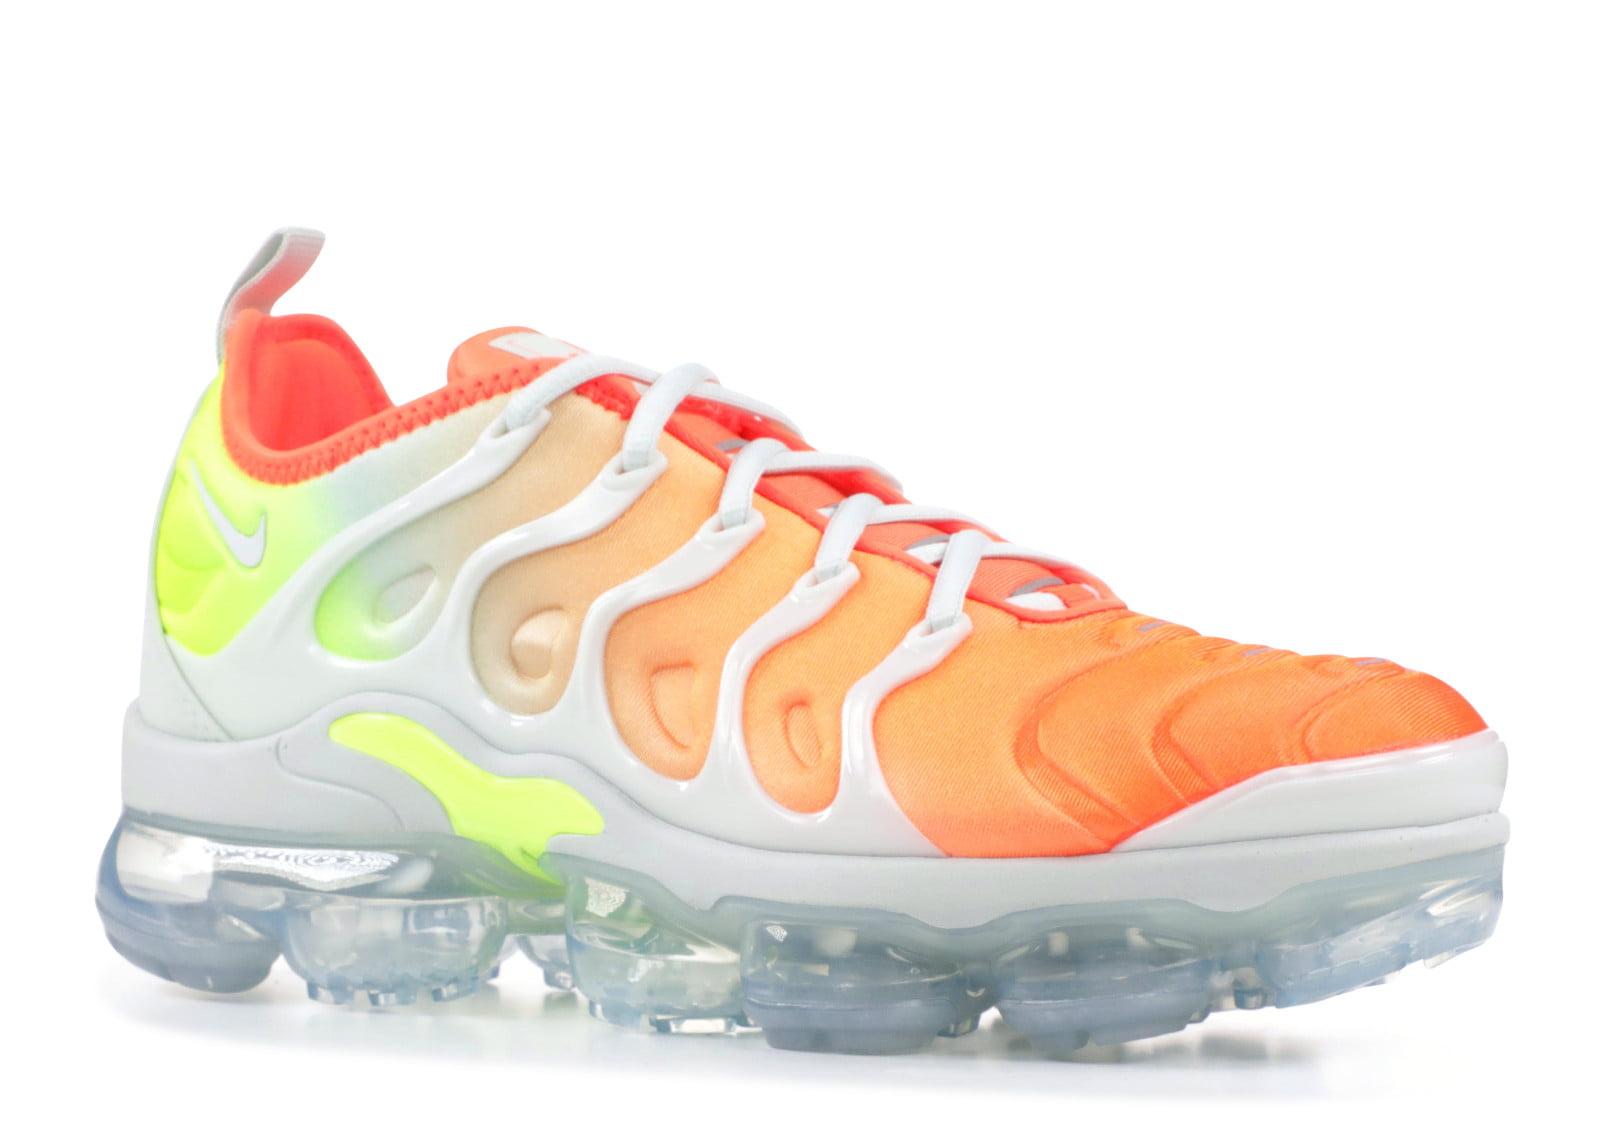 Nike - W AIR VAPORMAX PLUS 'BARELY GREY